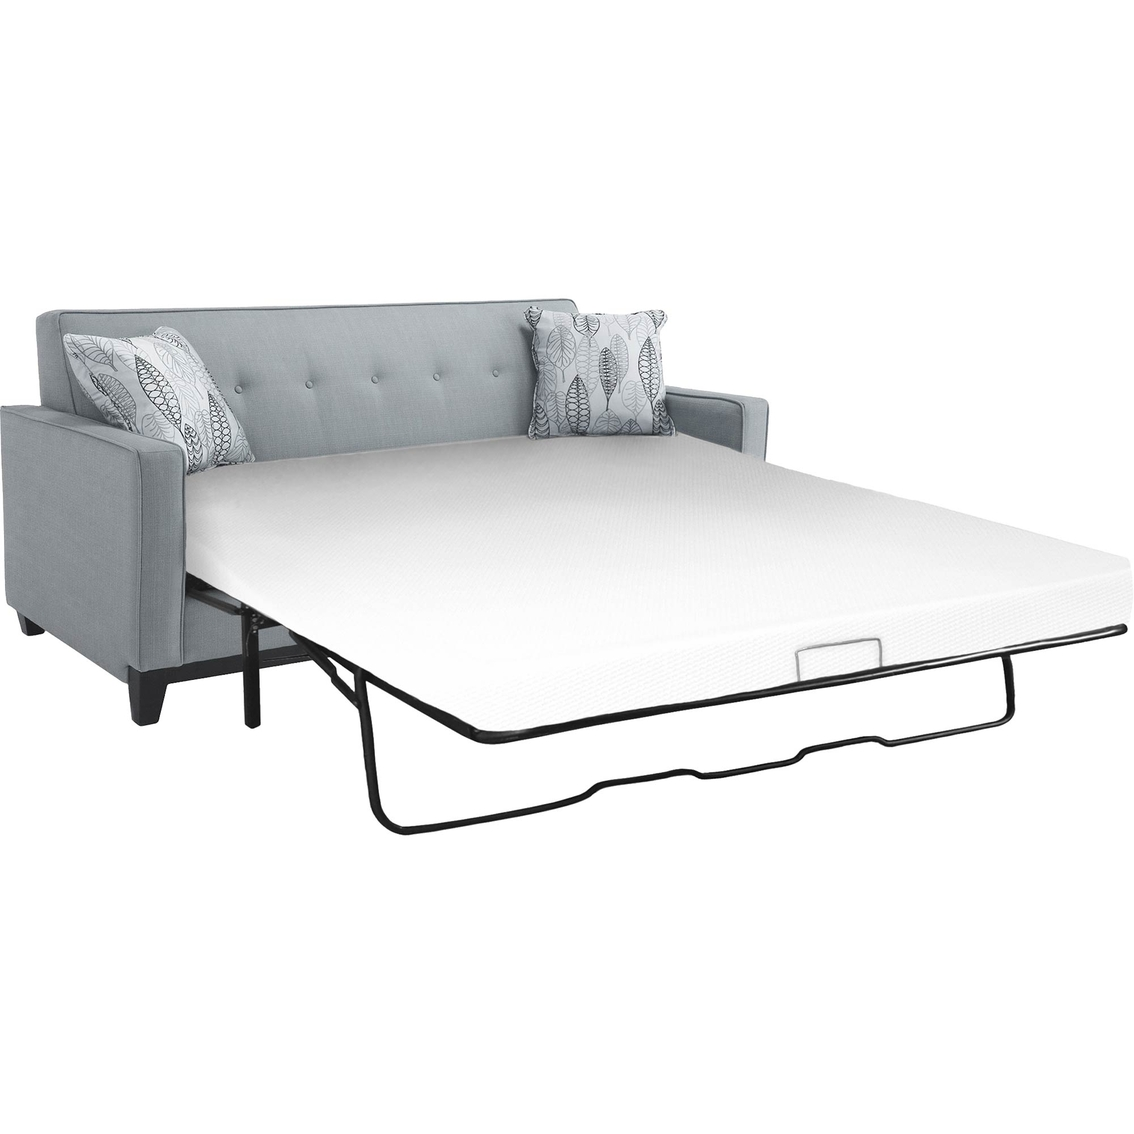 snuggle home memory foam twin sleep sofa replacement mattress mattresses home appliances. Black Bedroom Furniture Sets. Home Design Ideas